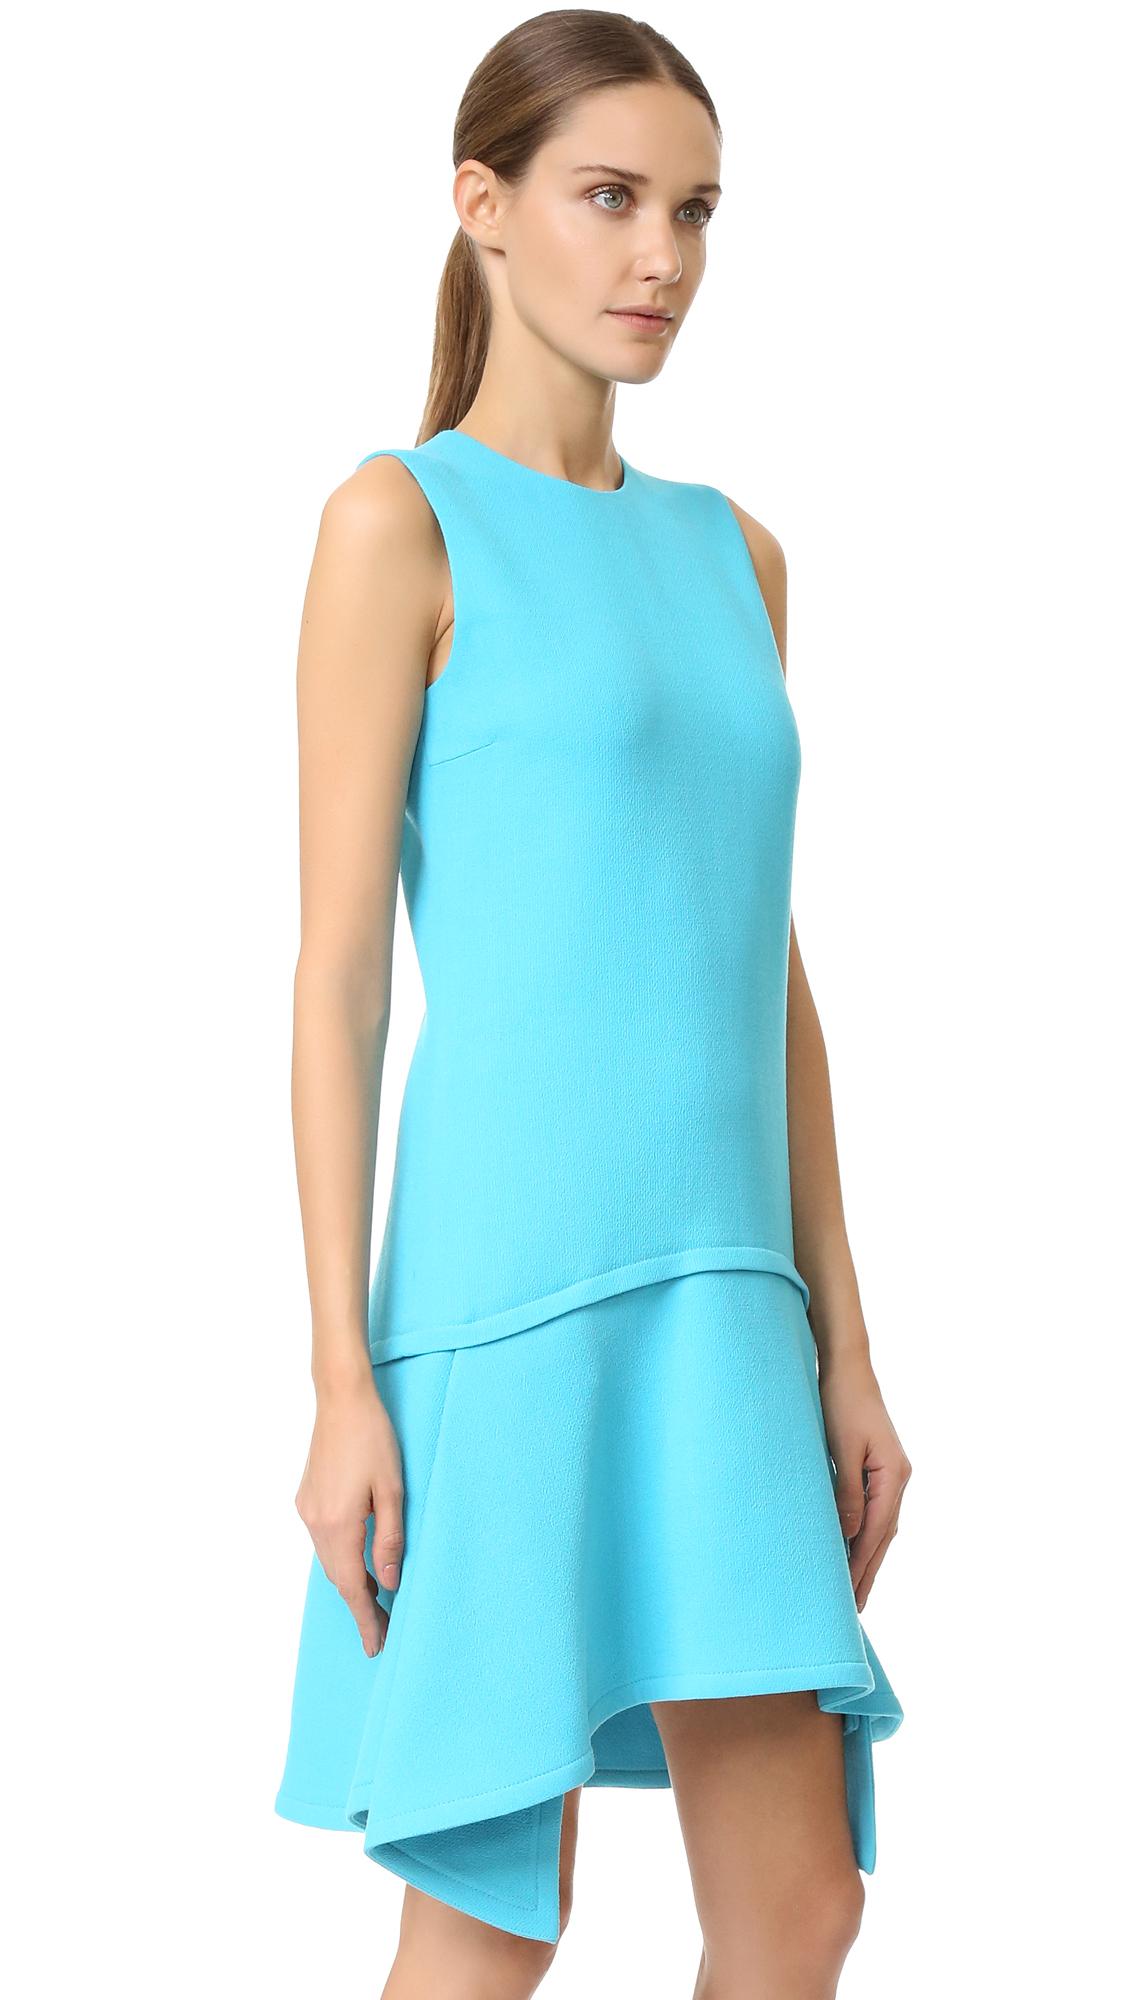 Victoria, Victoria Beckham Draped Skirt Dress in Blue